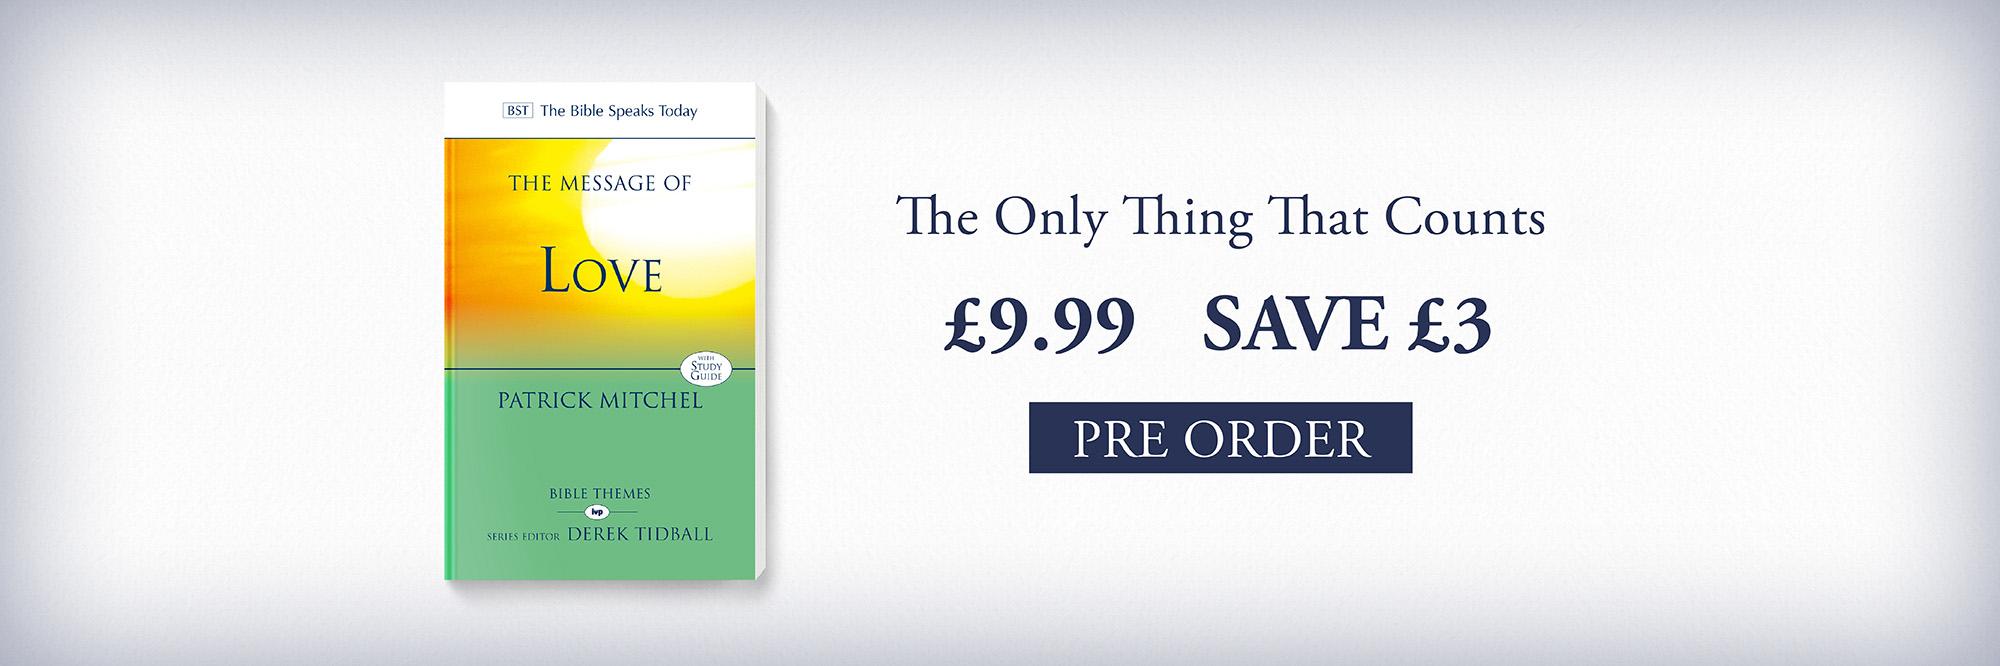 Inter-Varsity Press (IVP) one of the UKs leading Evangelical